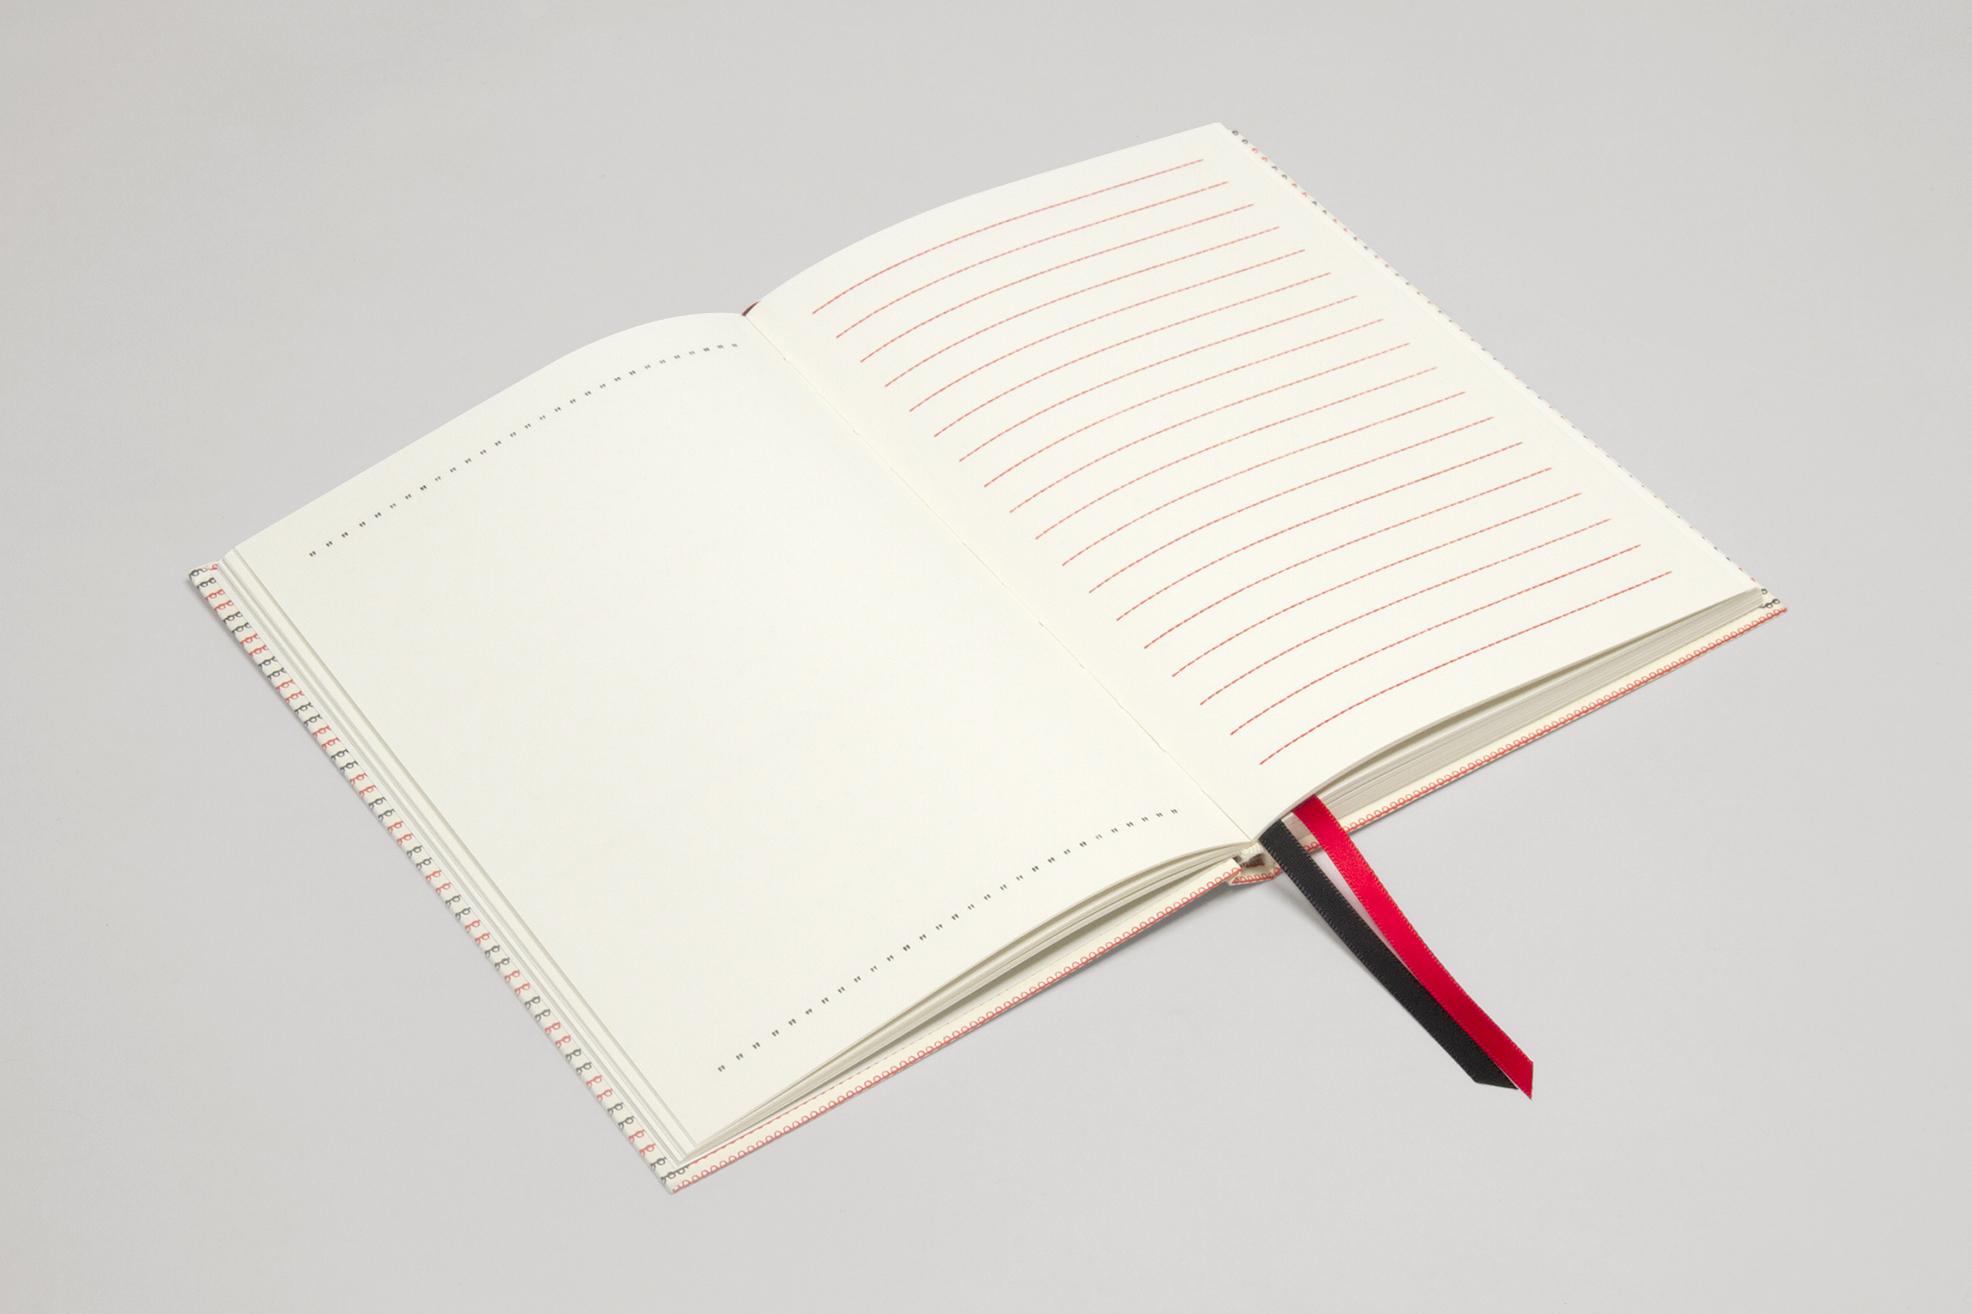 olivetti notebook 2